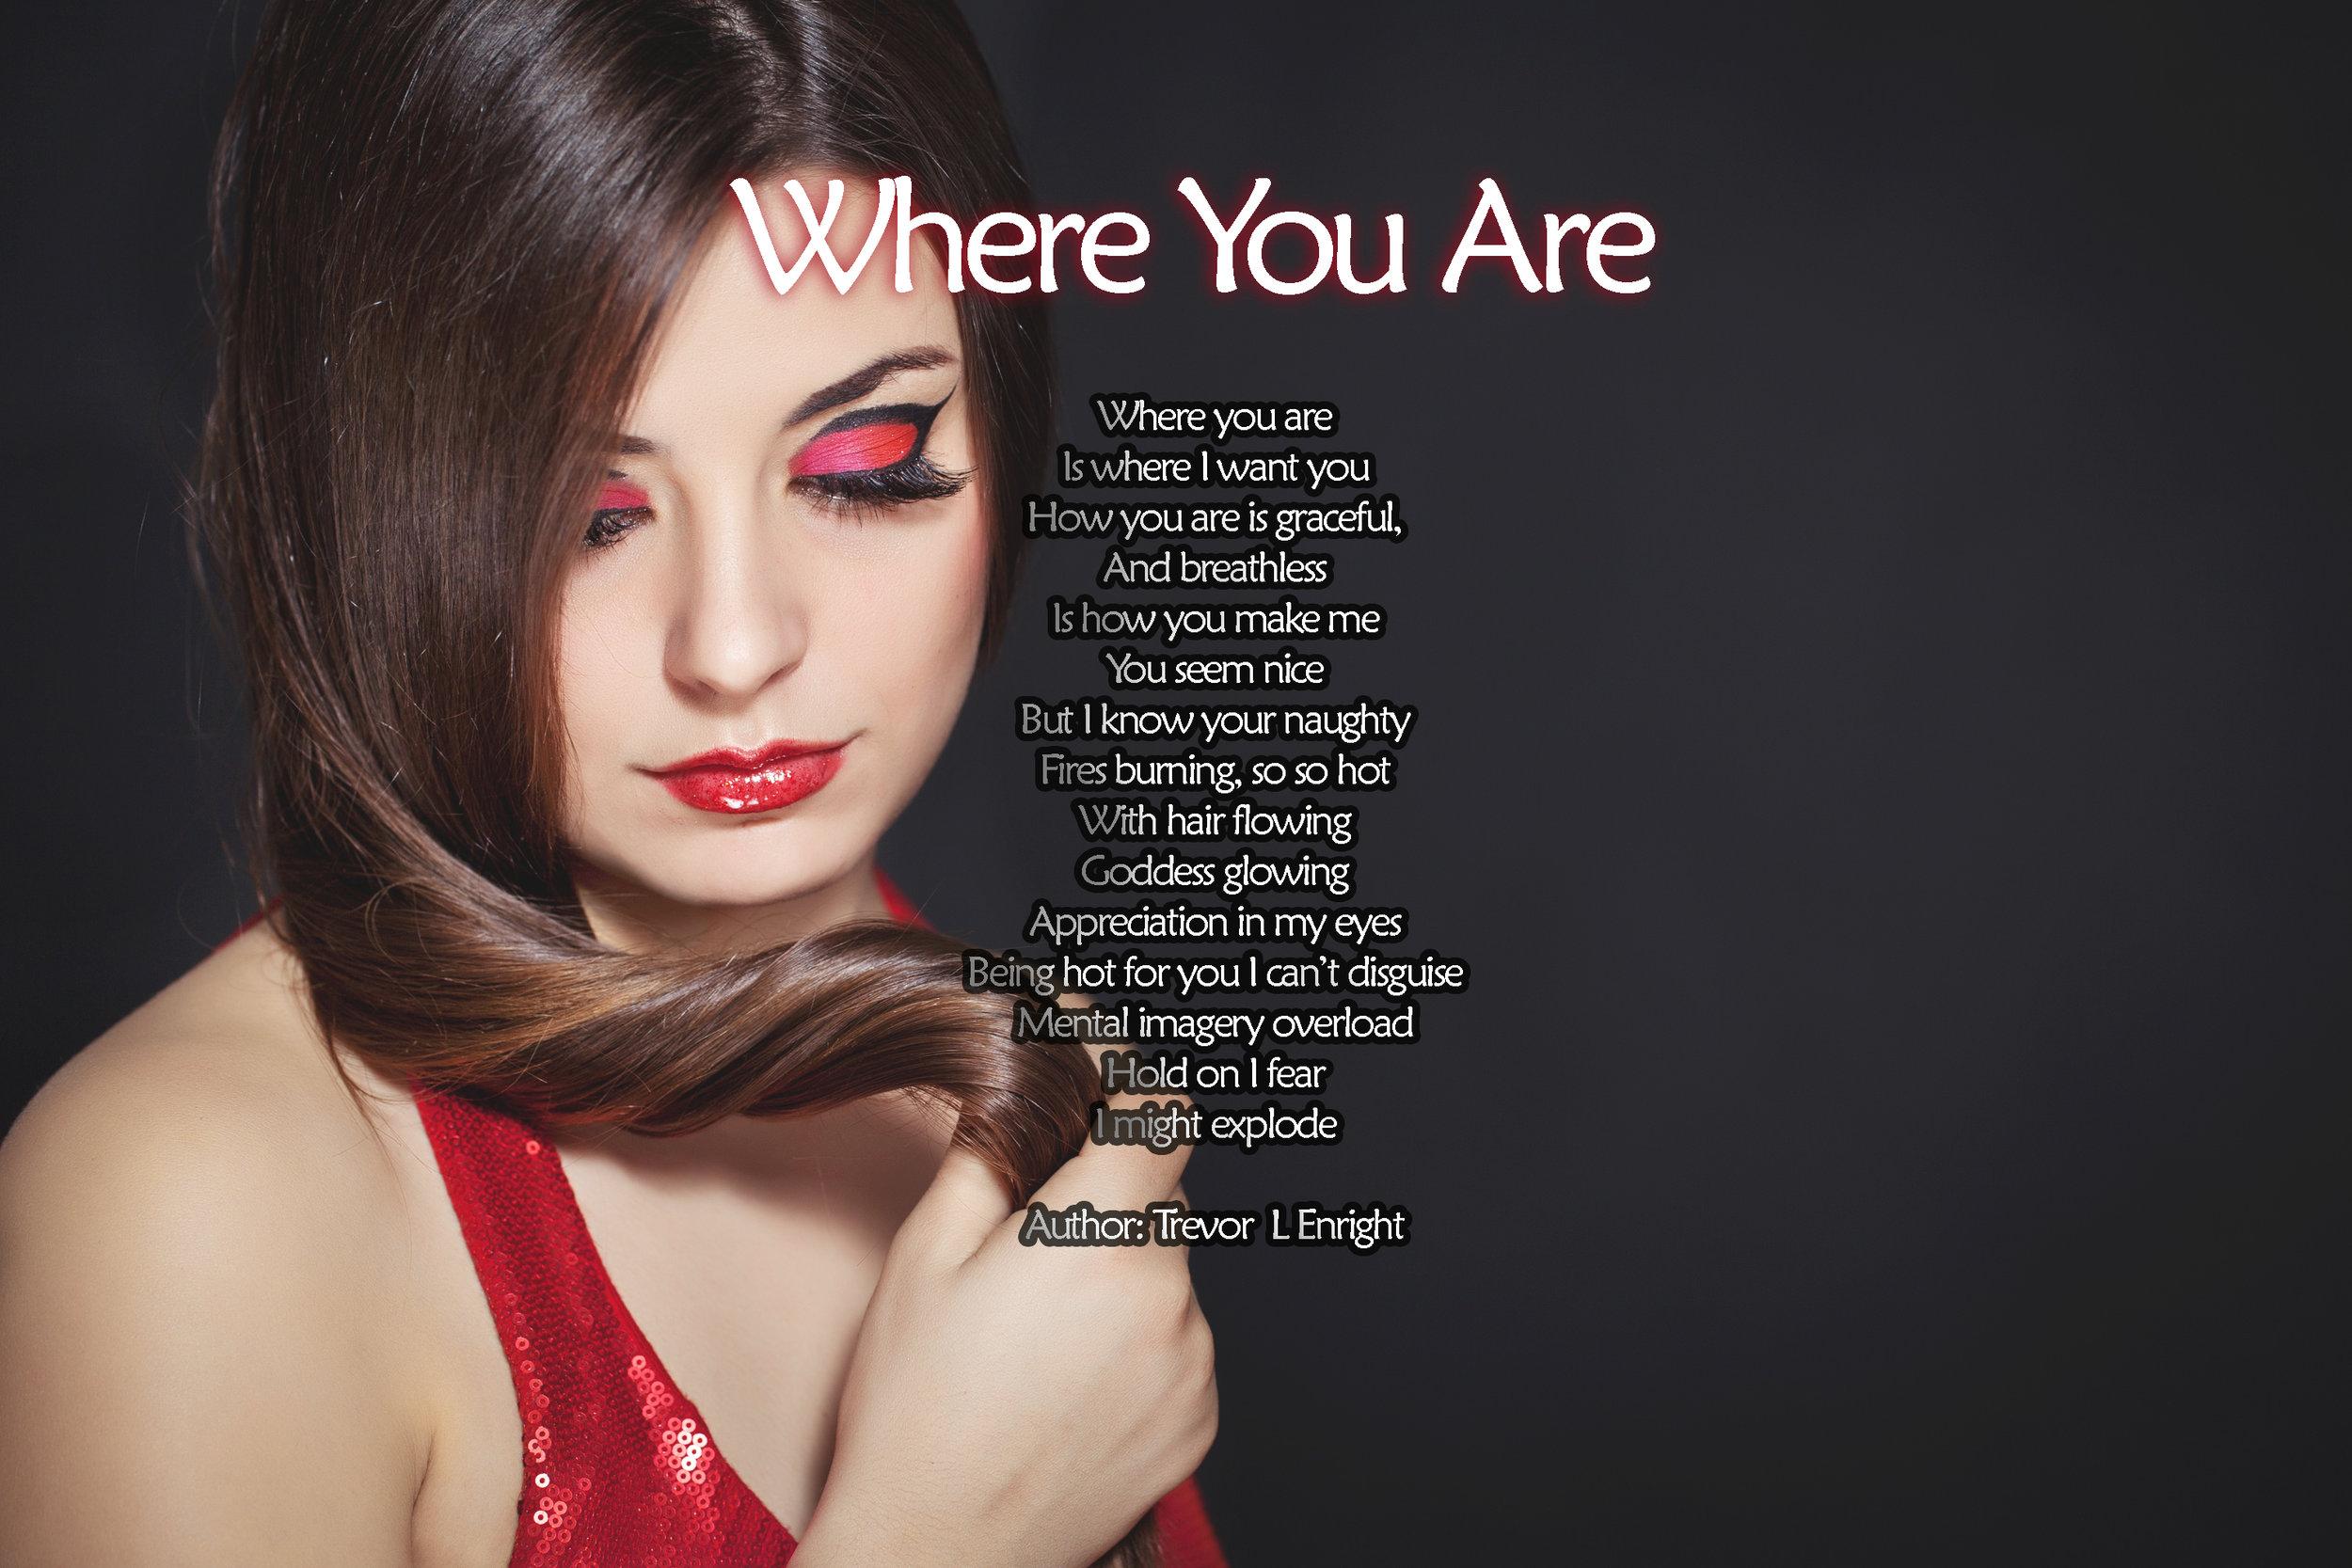 WhereYouAre.jpg